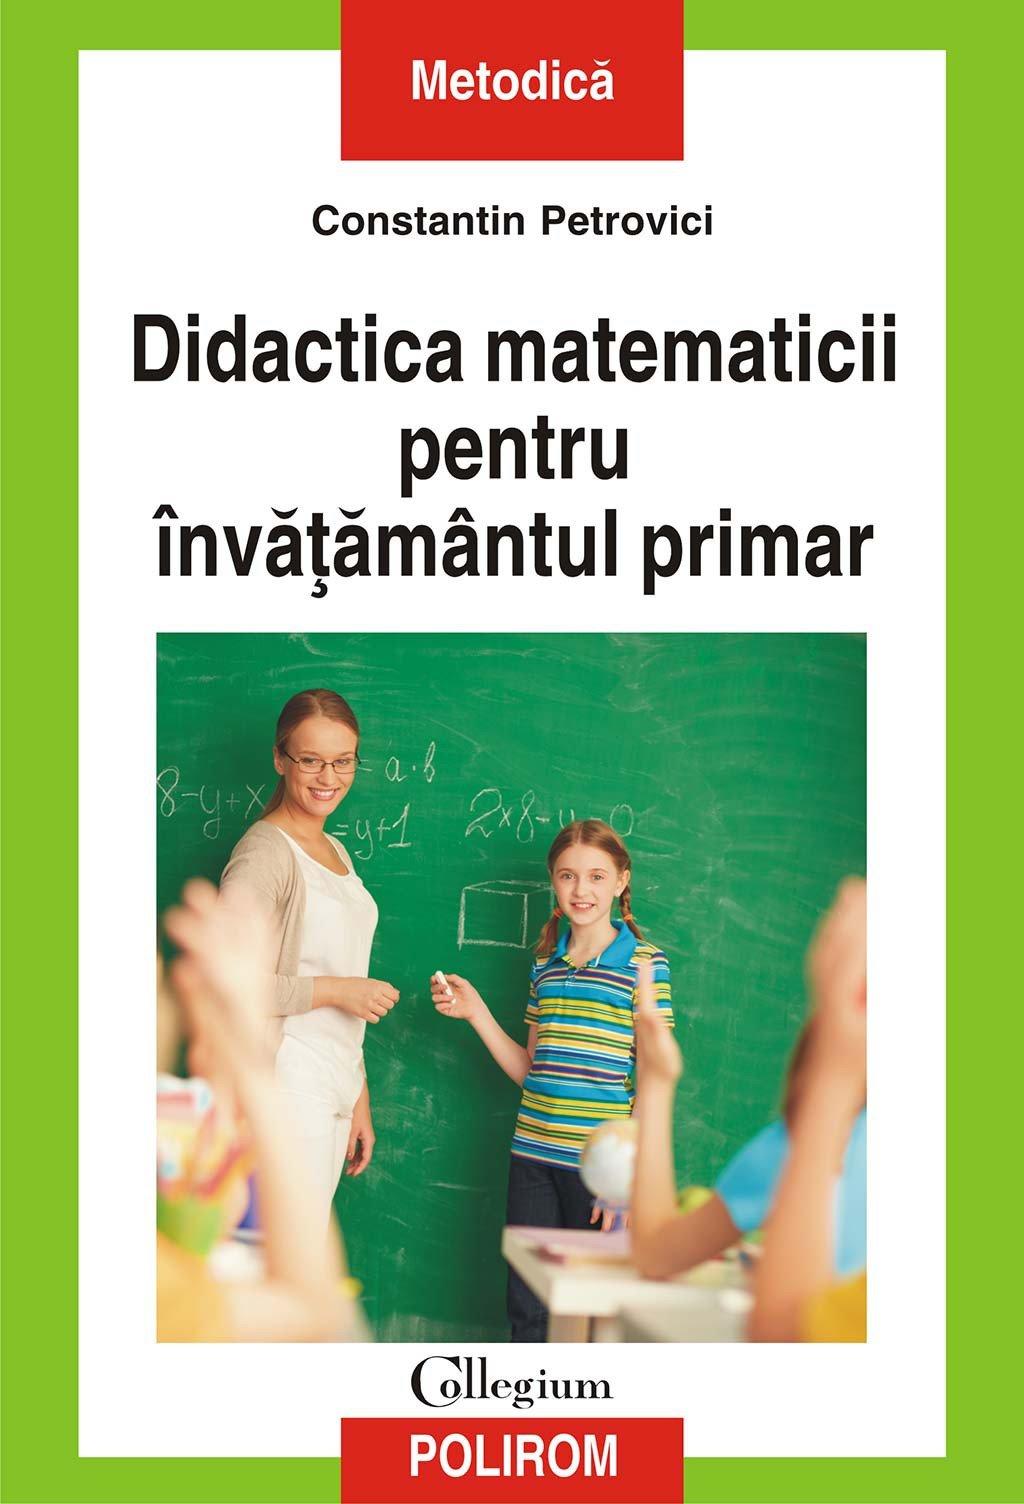 Didactica matematicii pentru invatamantul primar (eBook) pdf pret librarie elefant oferta